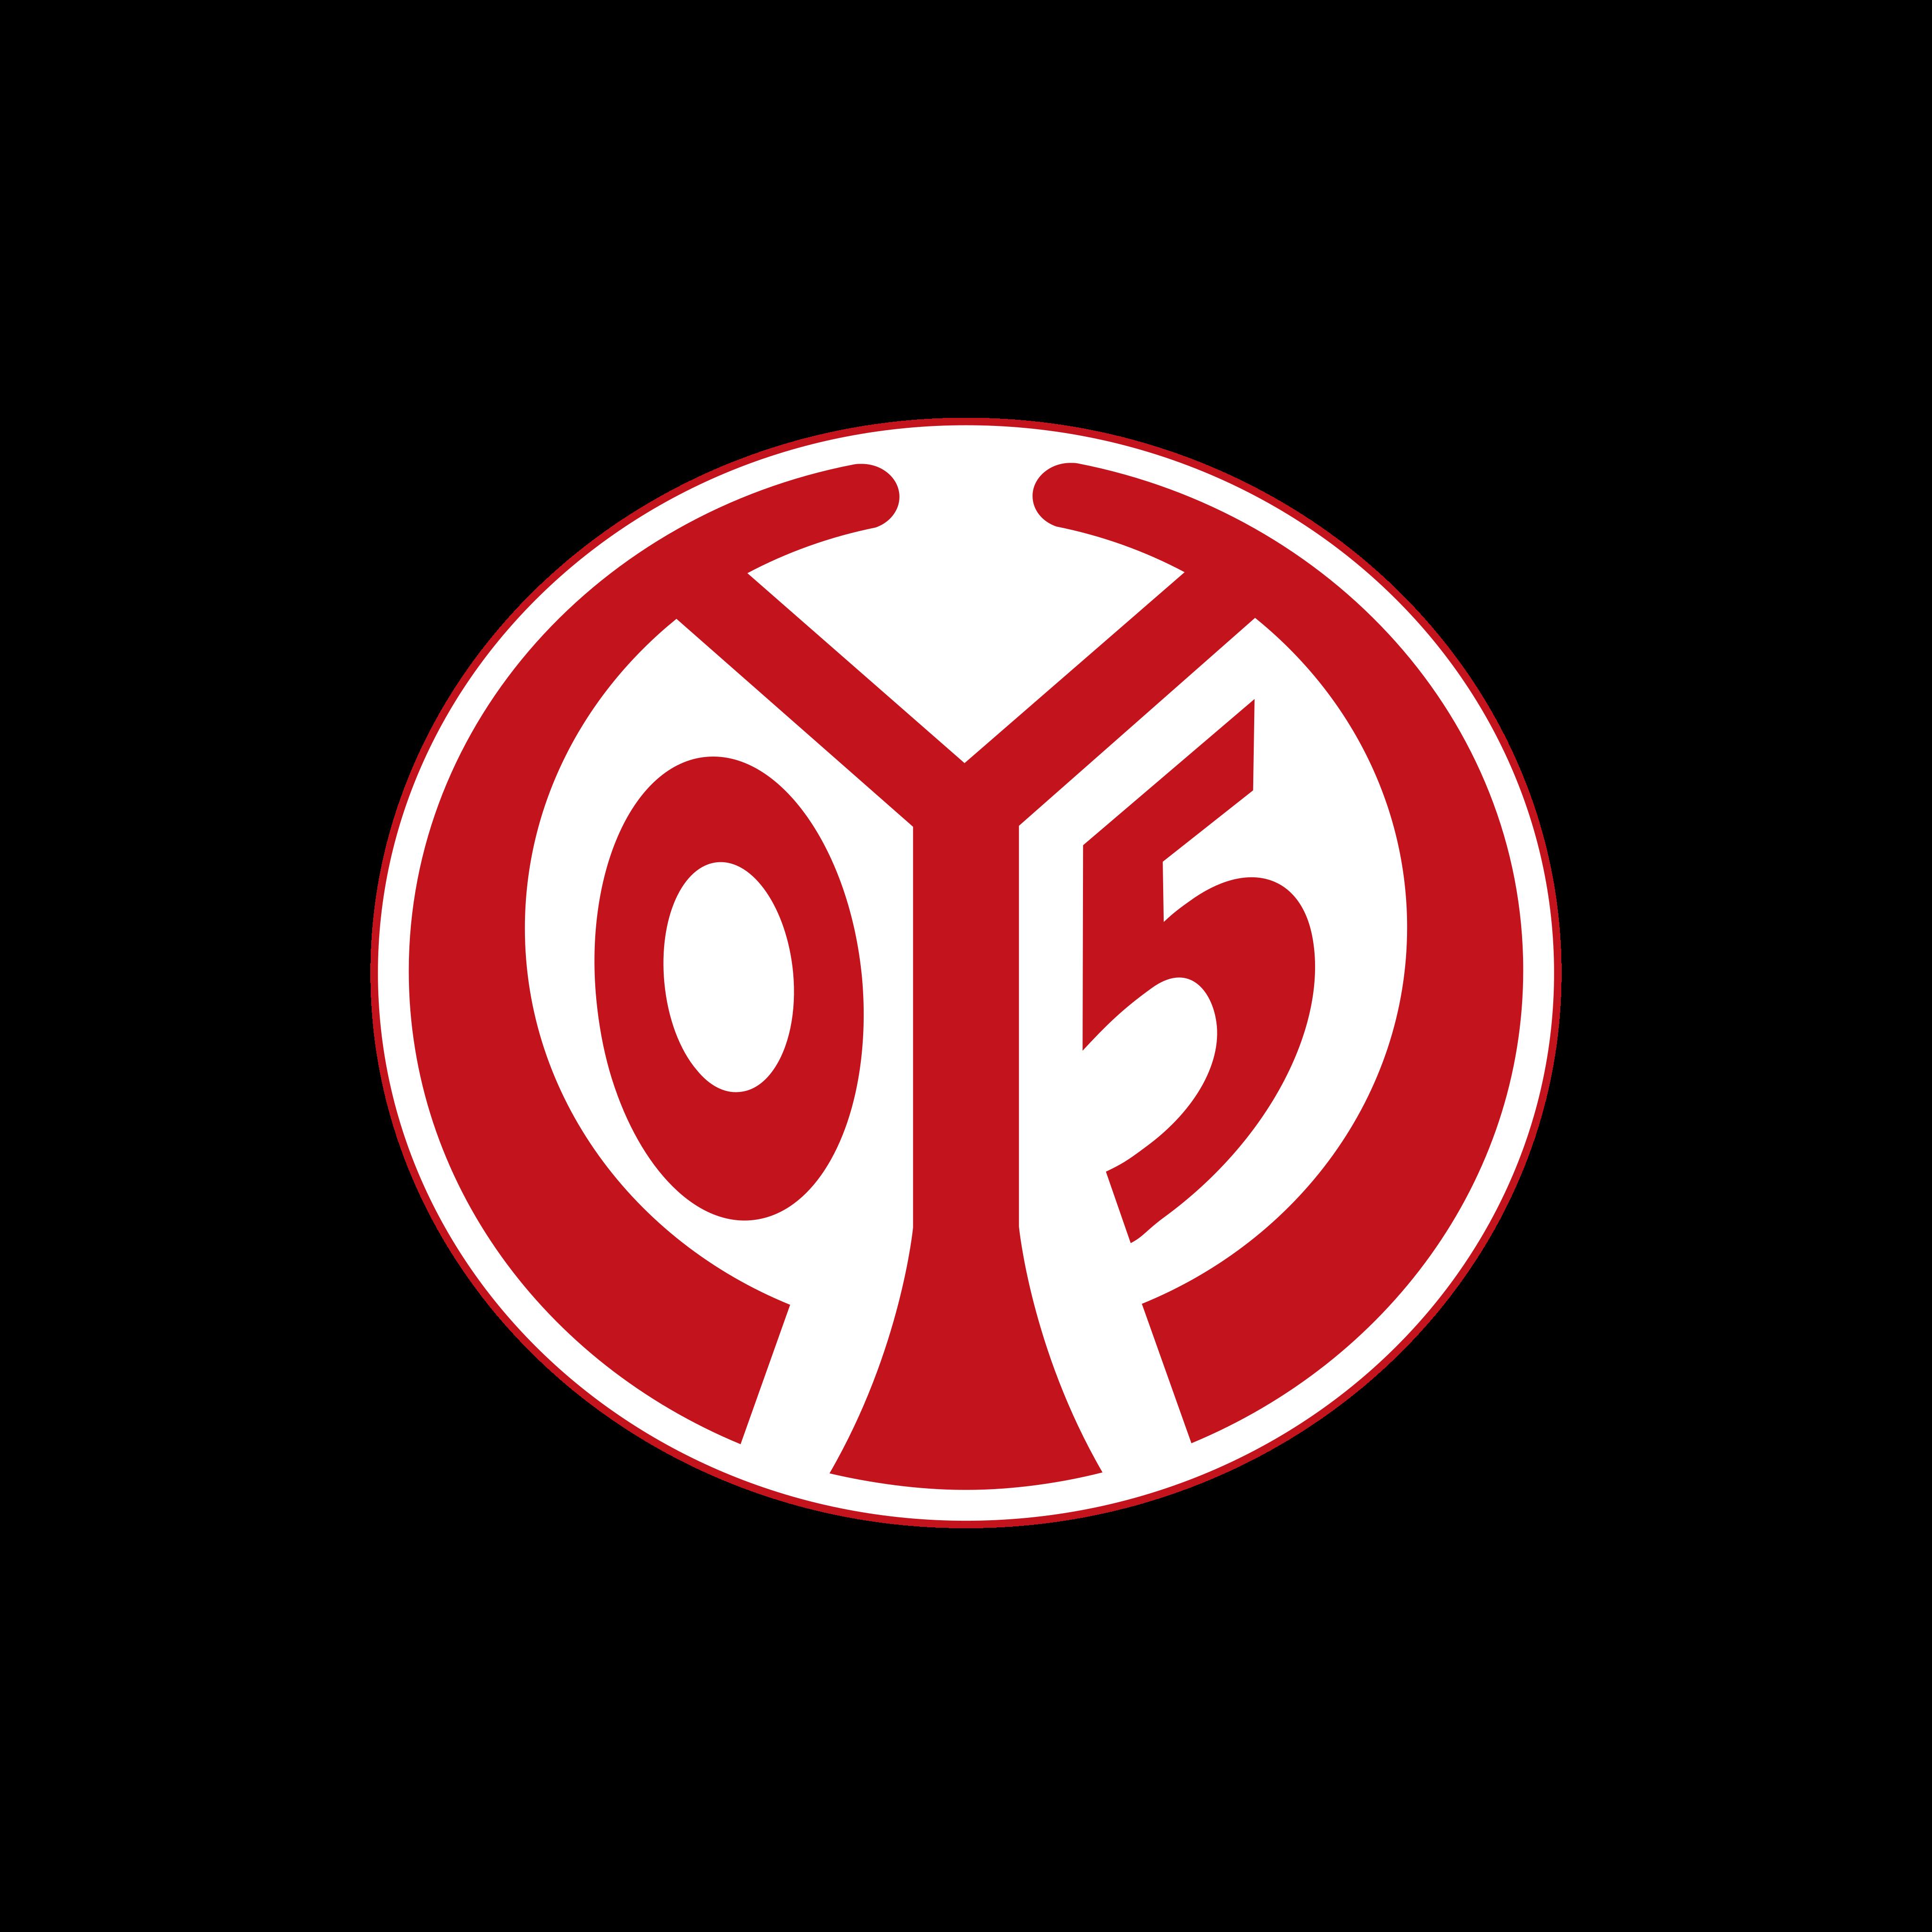 fsv mainz 05 logo 0 - FSV Mainz 05 Logo